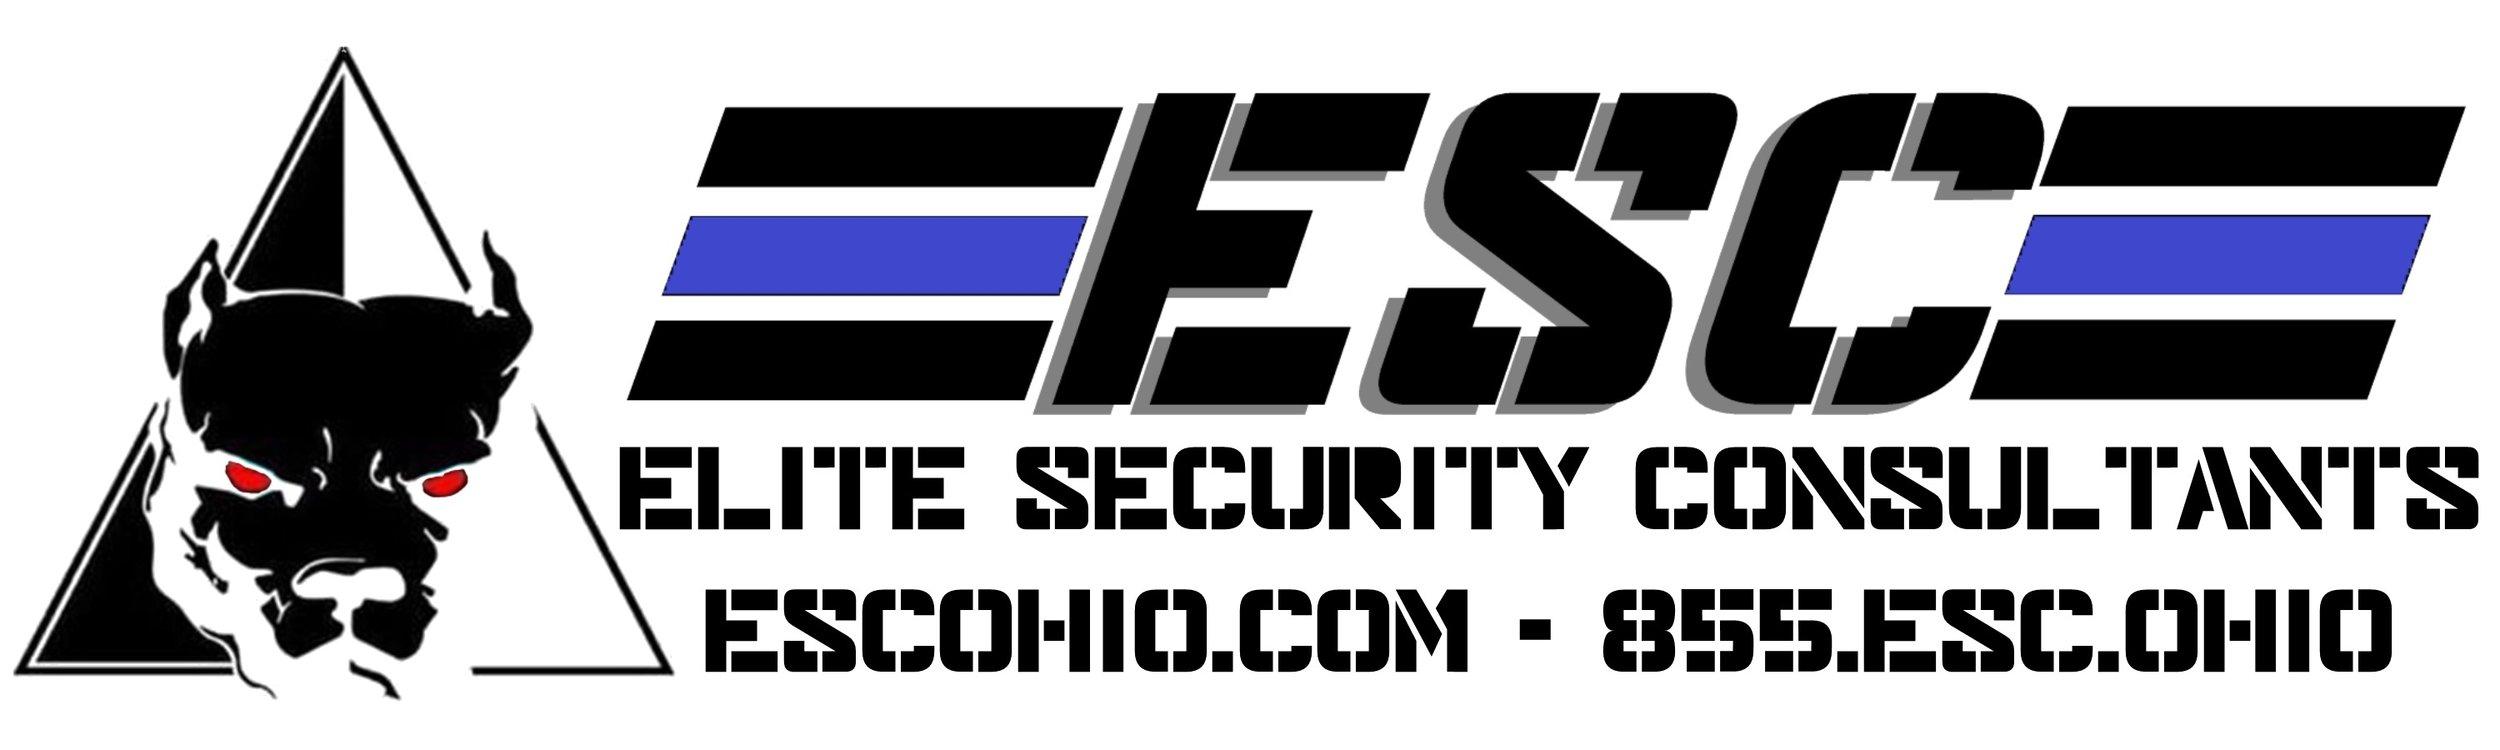 elite security logo.jpg